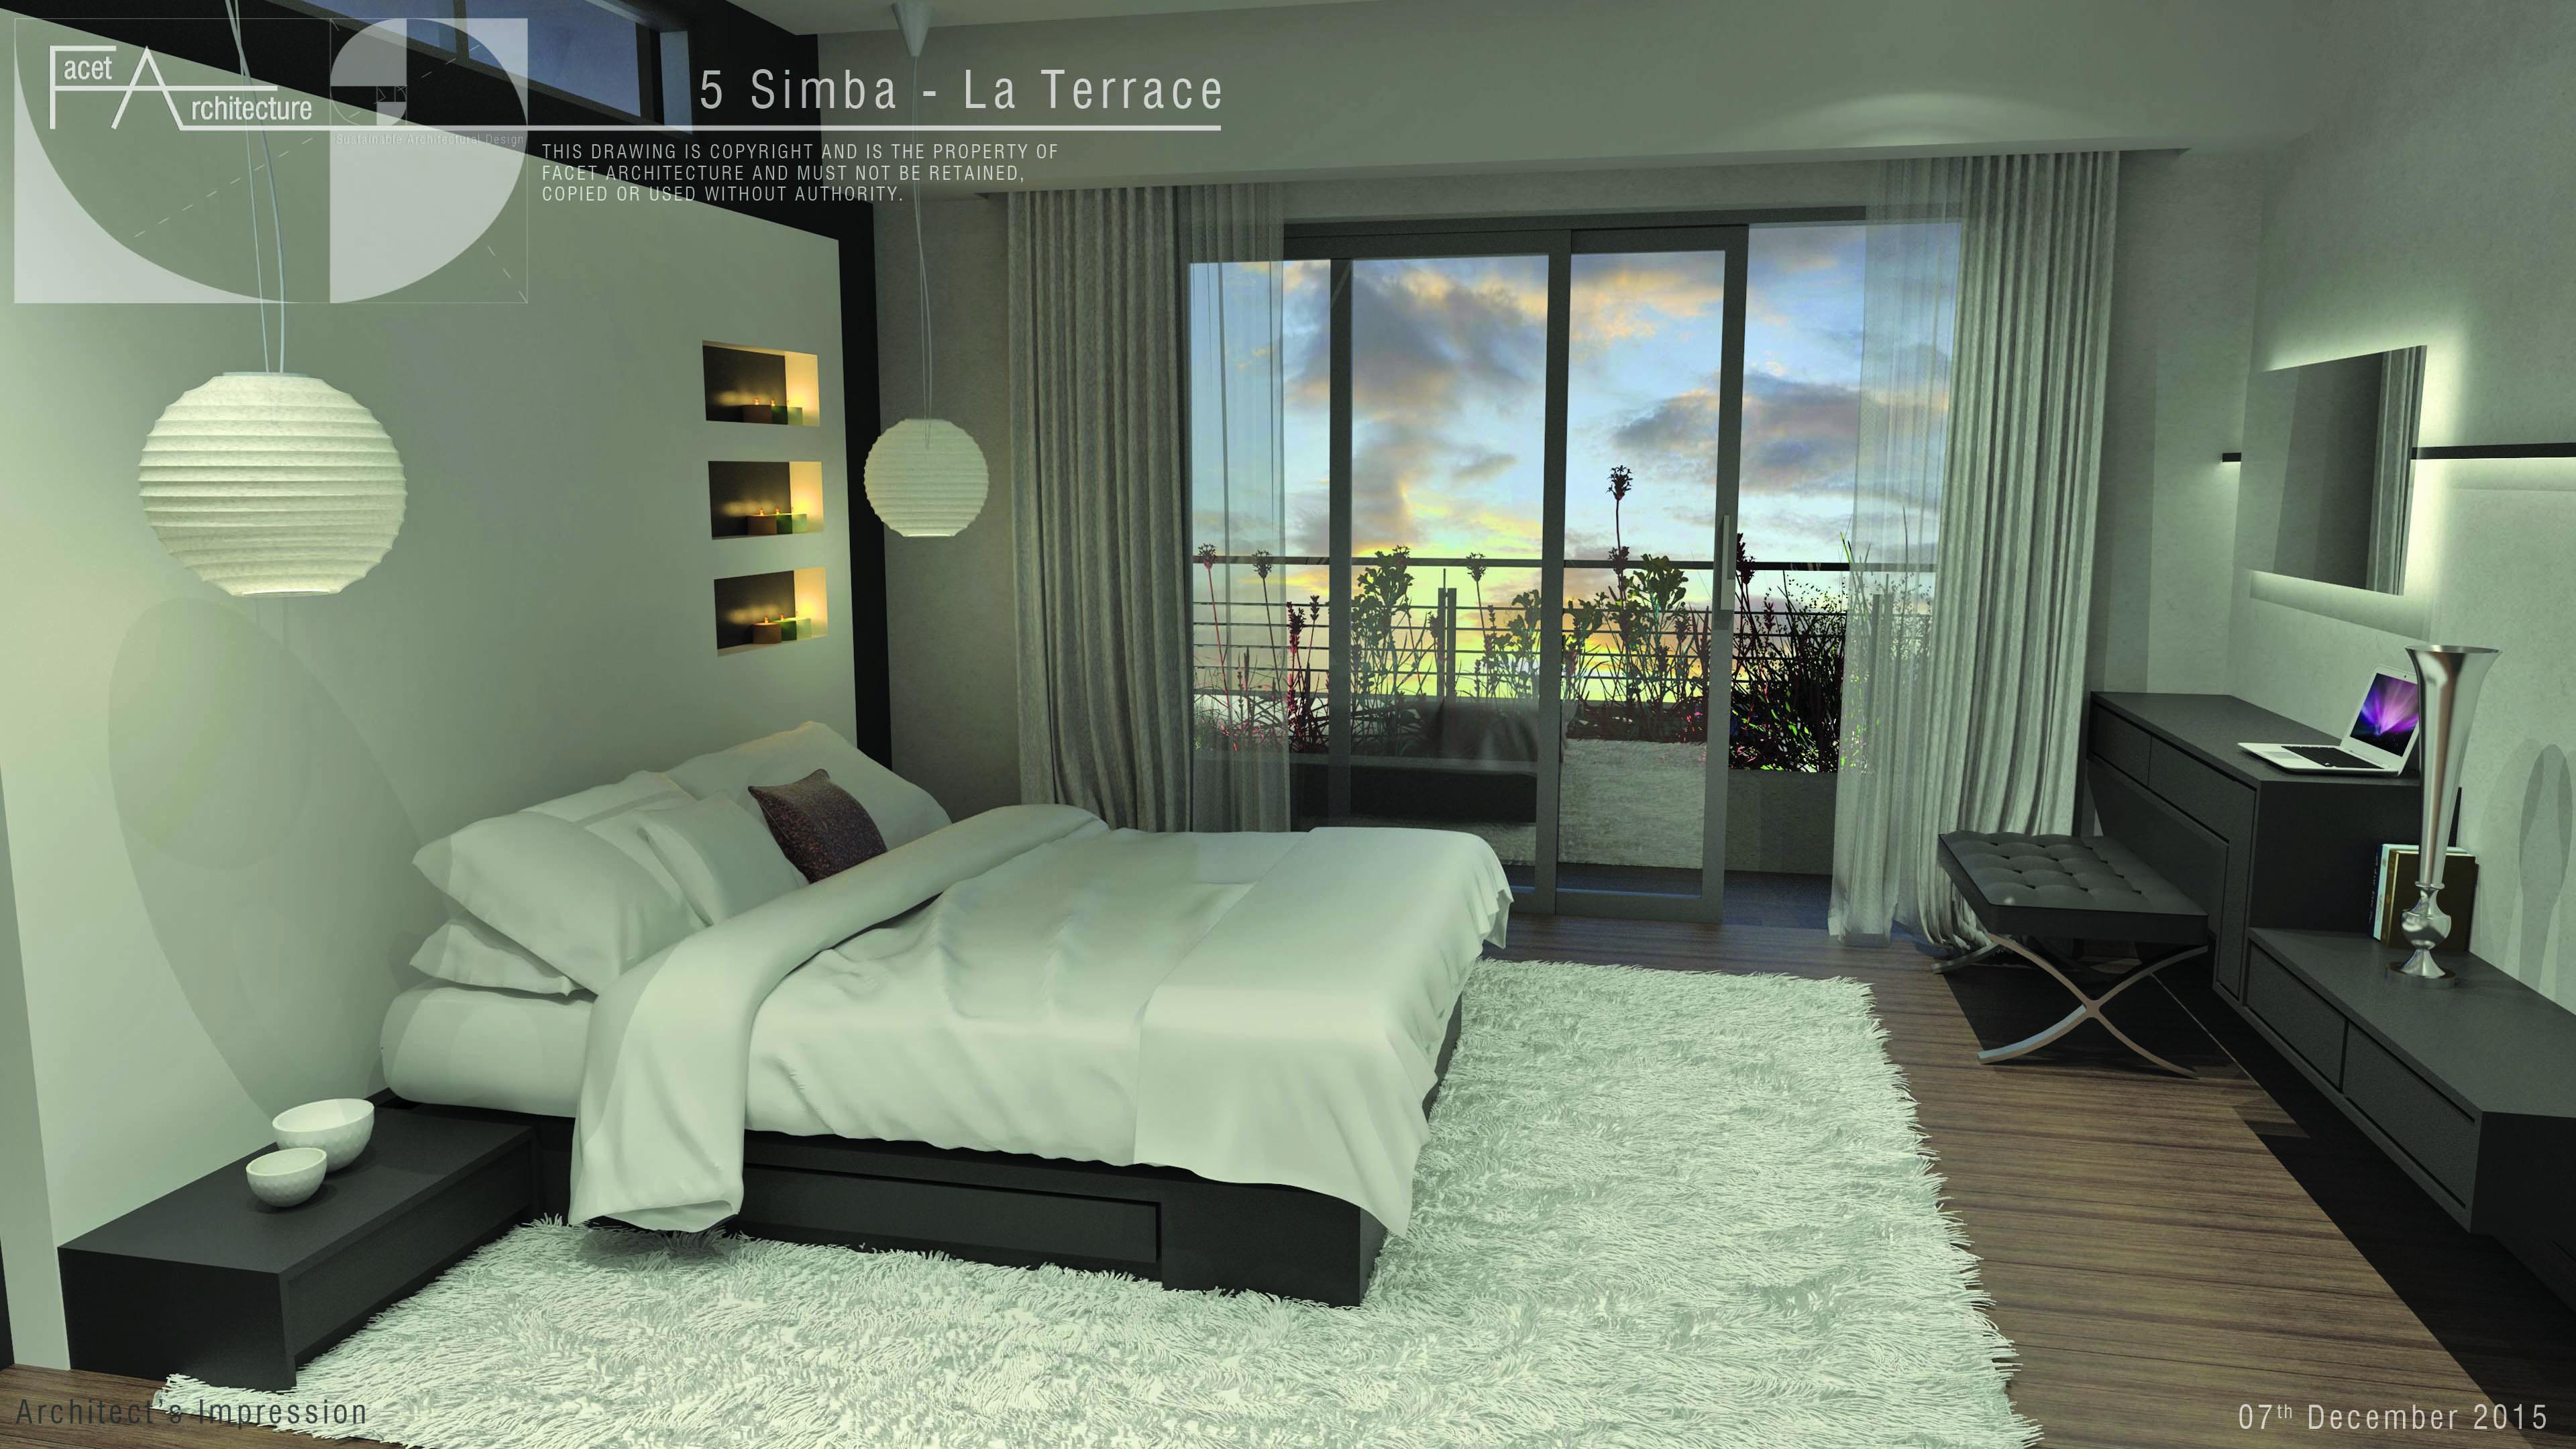 2015-12-07 FA15-21 5 Simba - Internal Bedroom